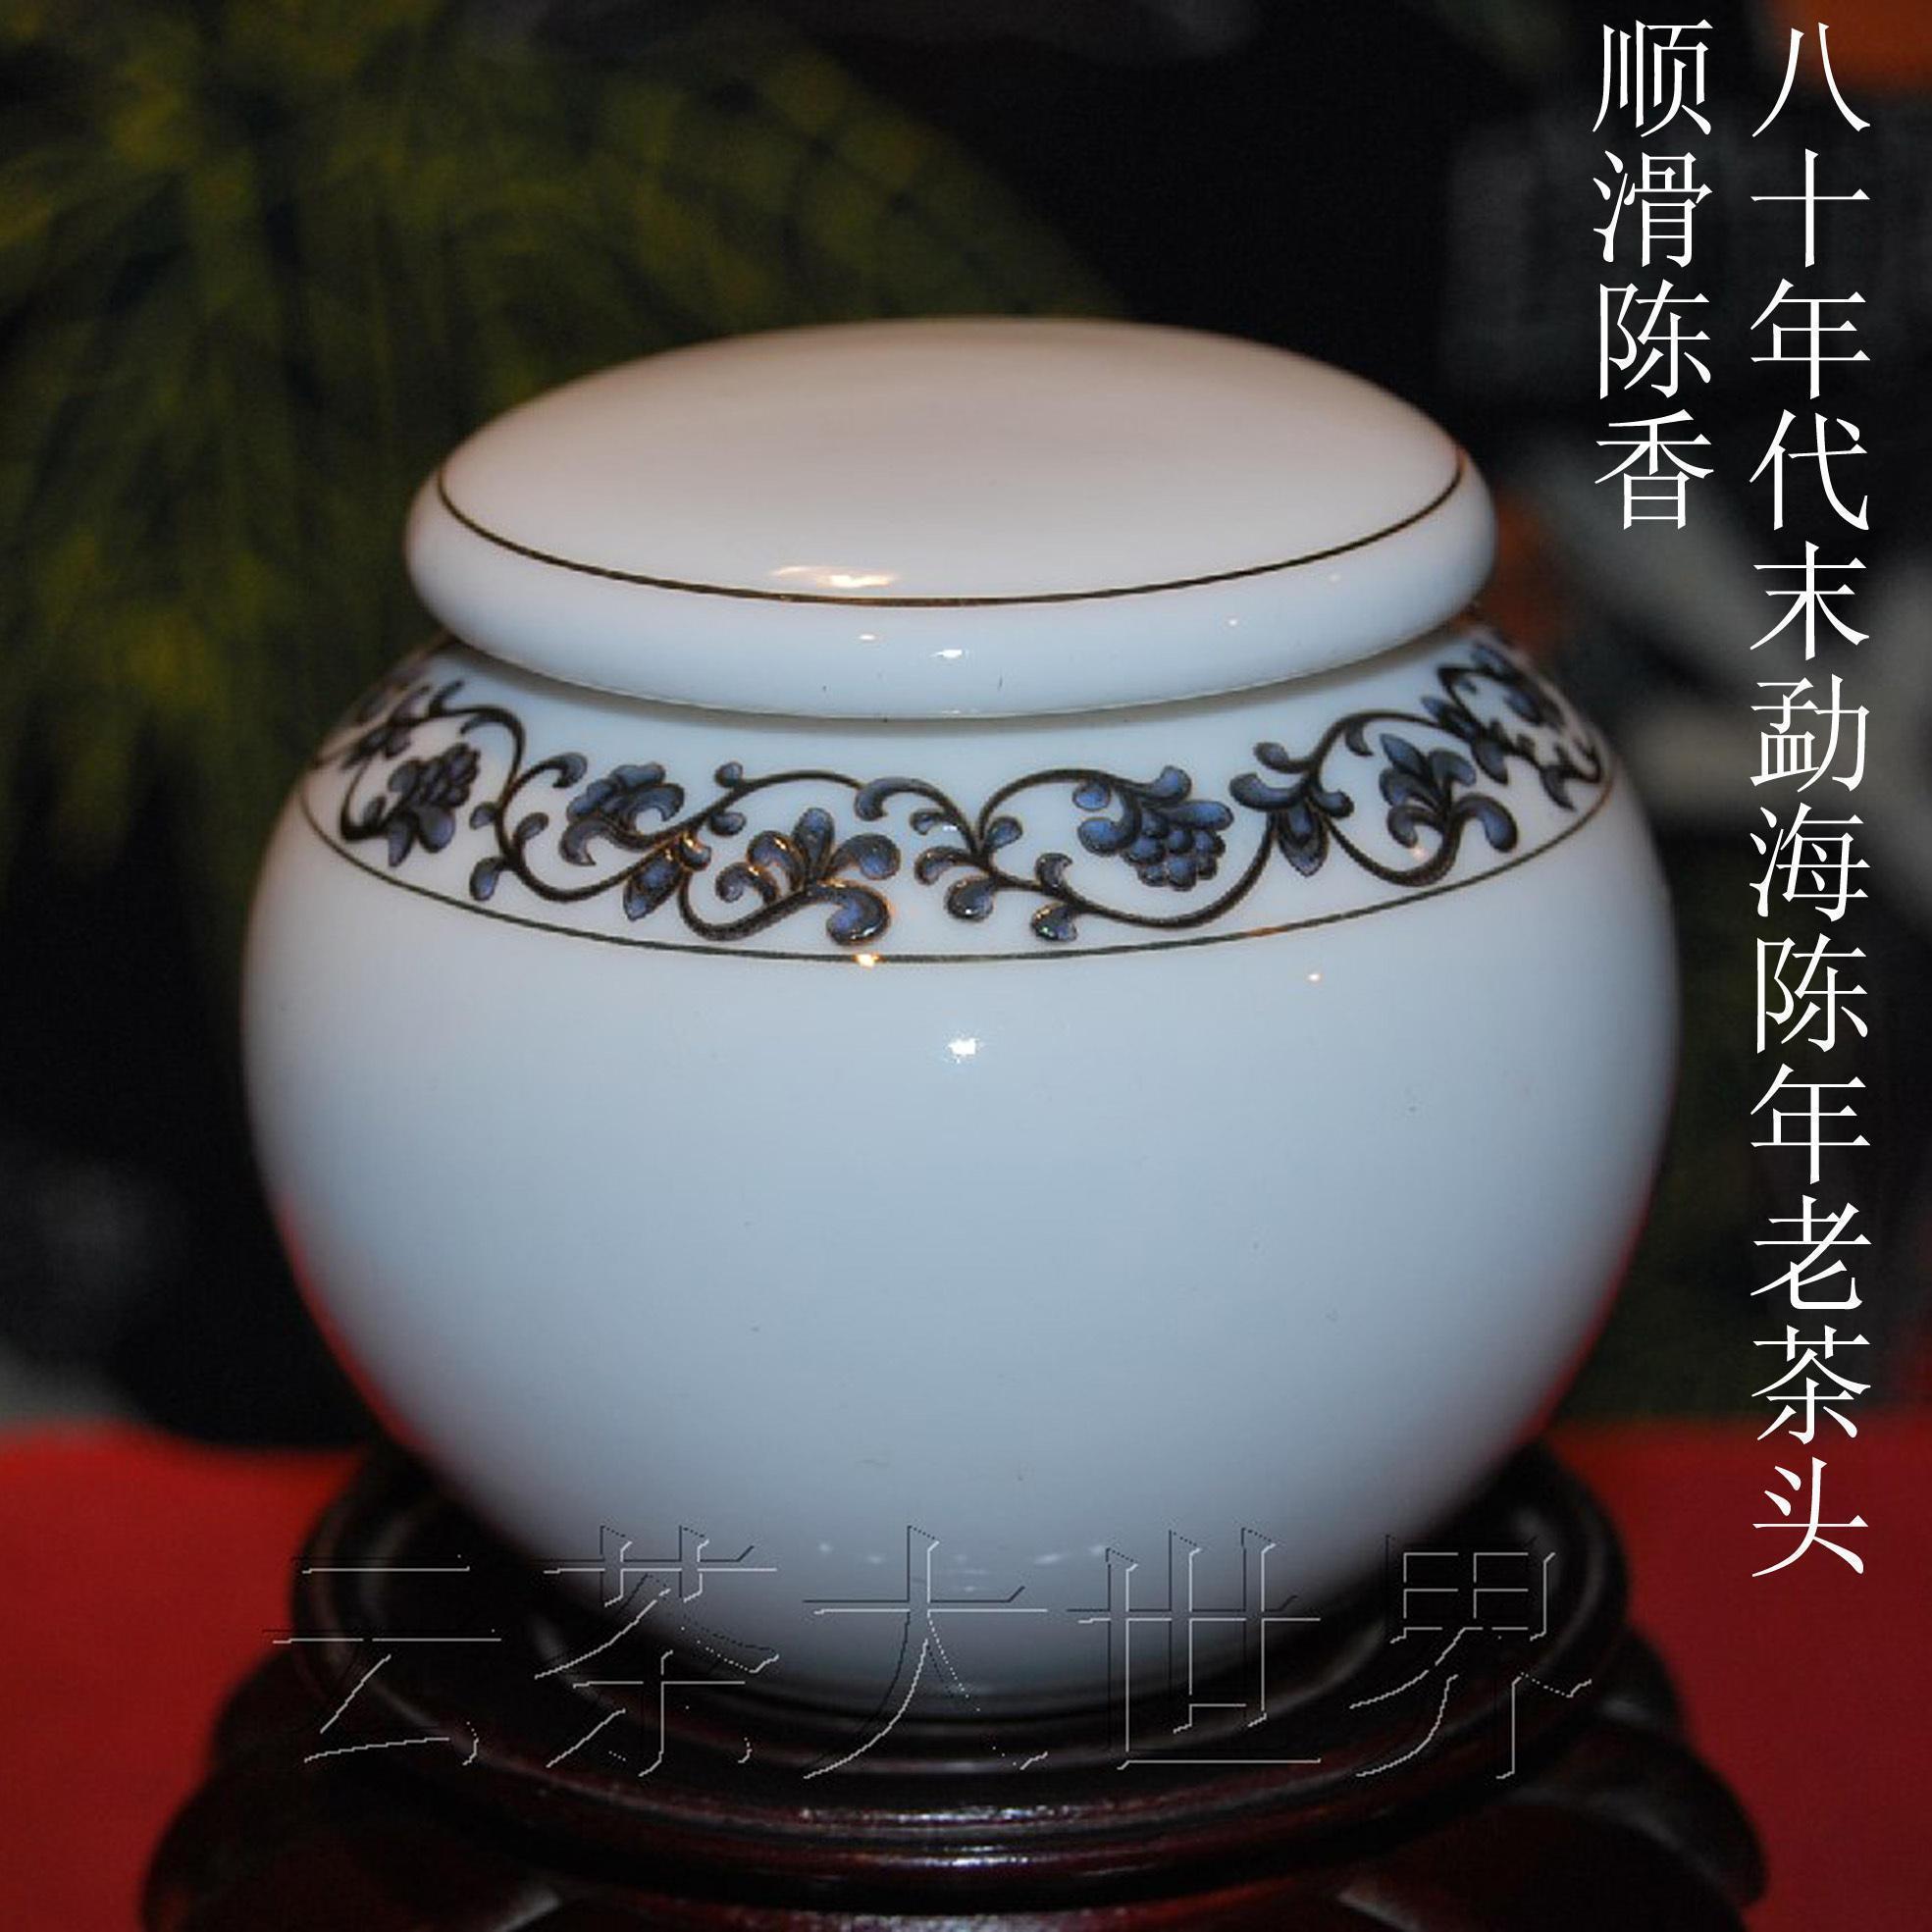 china raw puer puerh pu er pu erh pu er Pu er tea C BANNER leugth